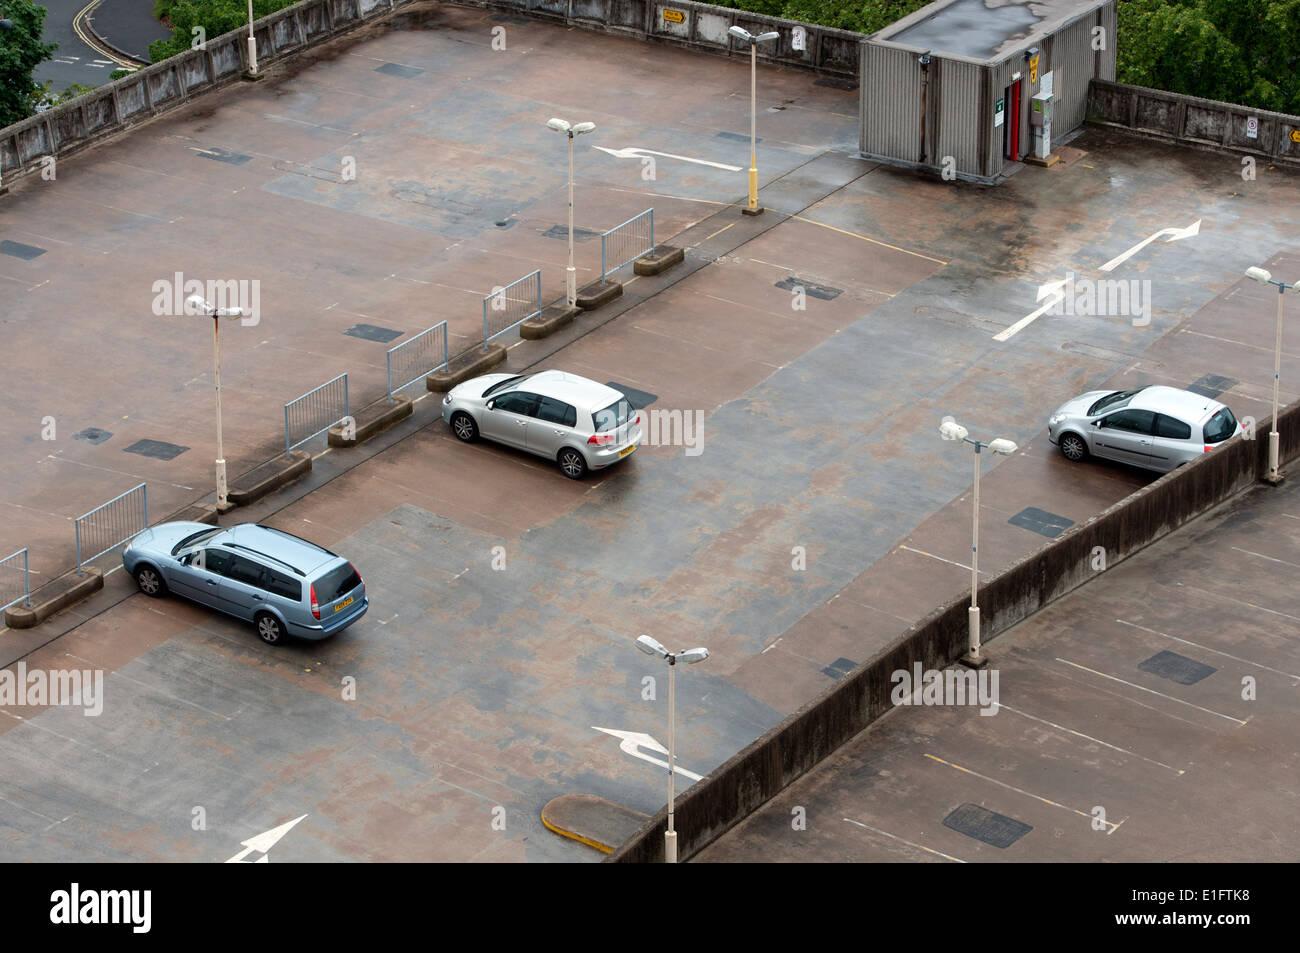 Multistorey car park rooftop, Birmingham city centre, UK - Stock Image